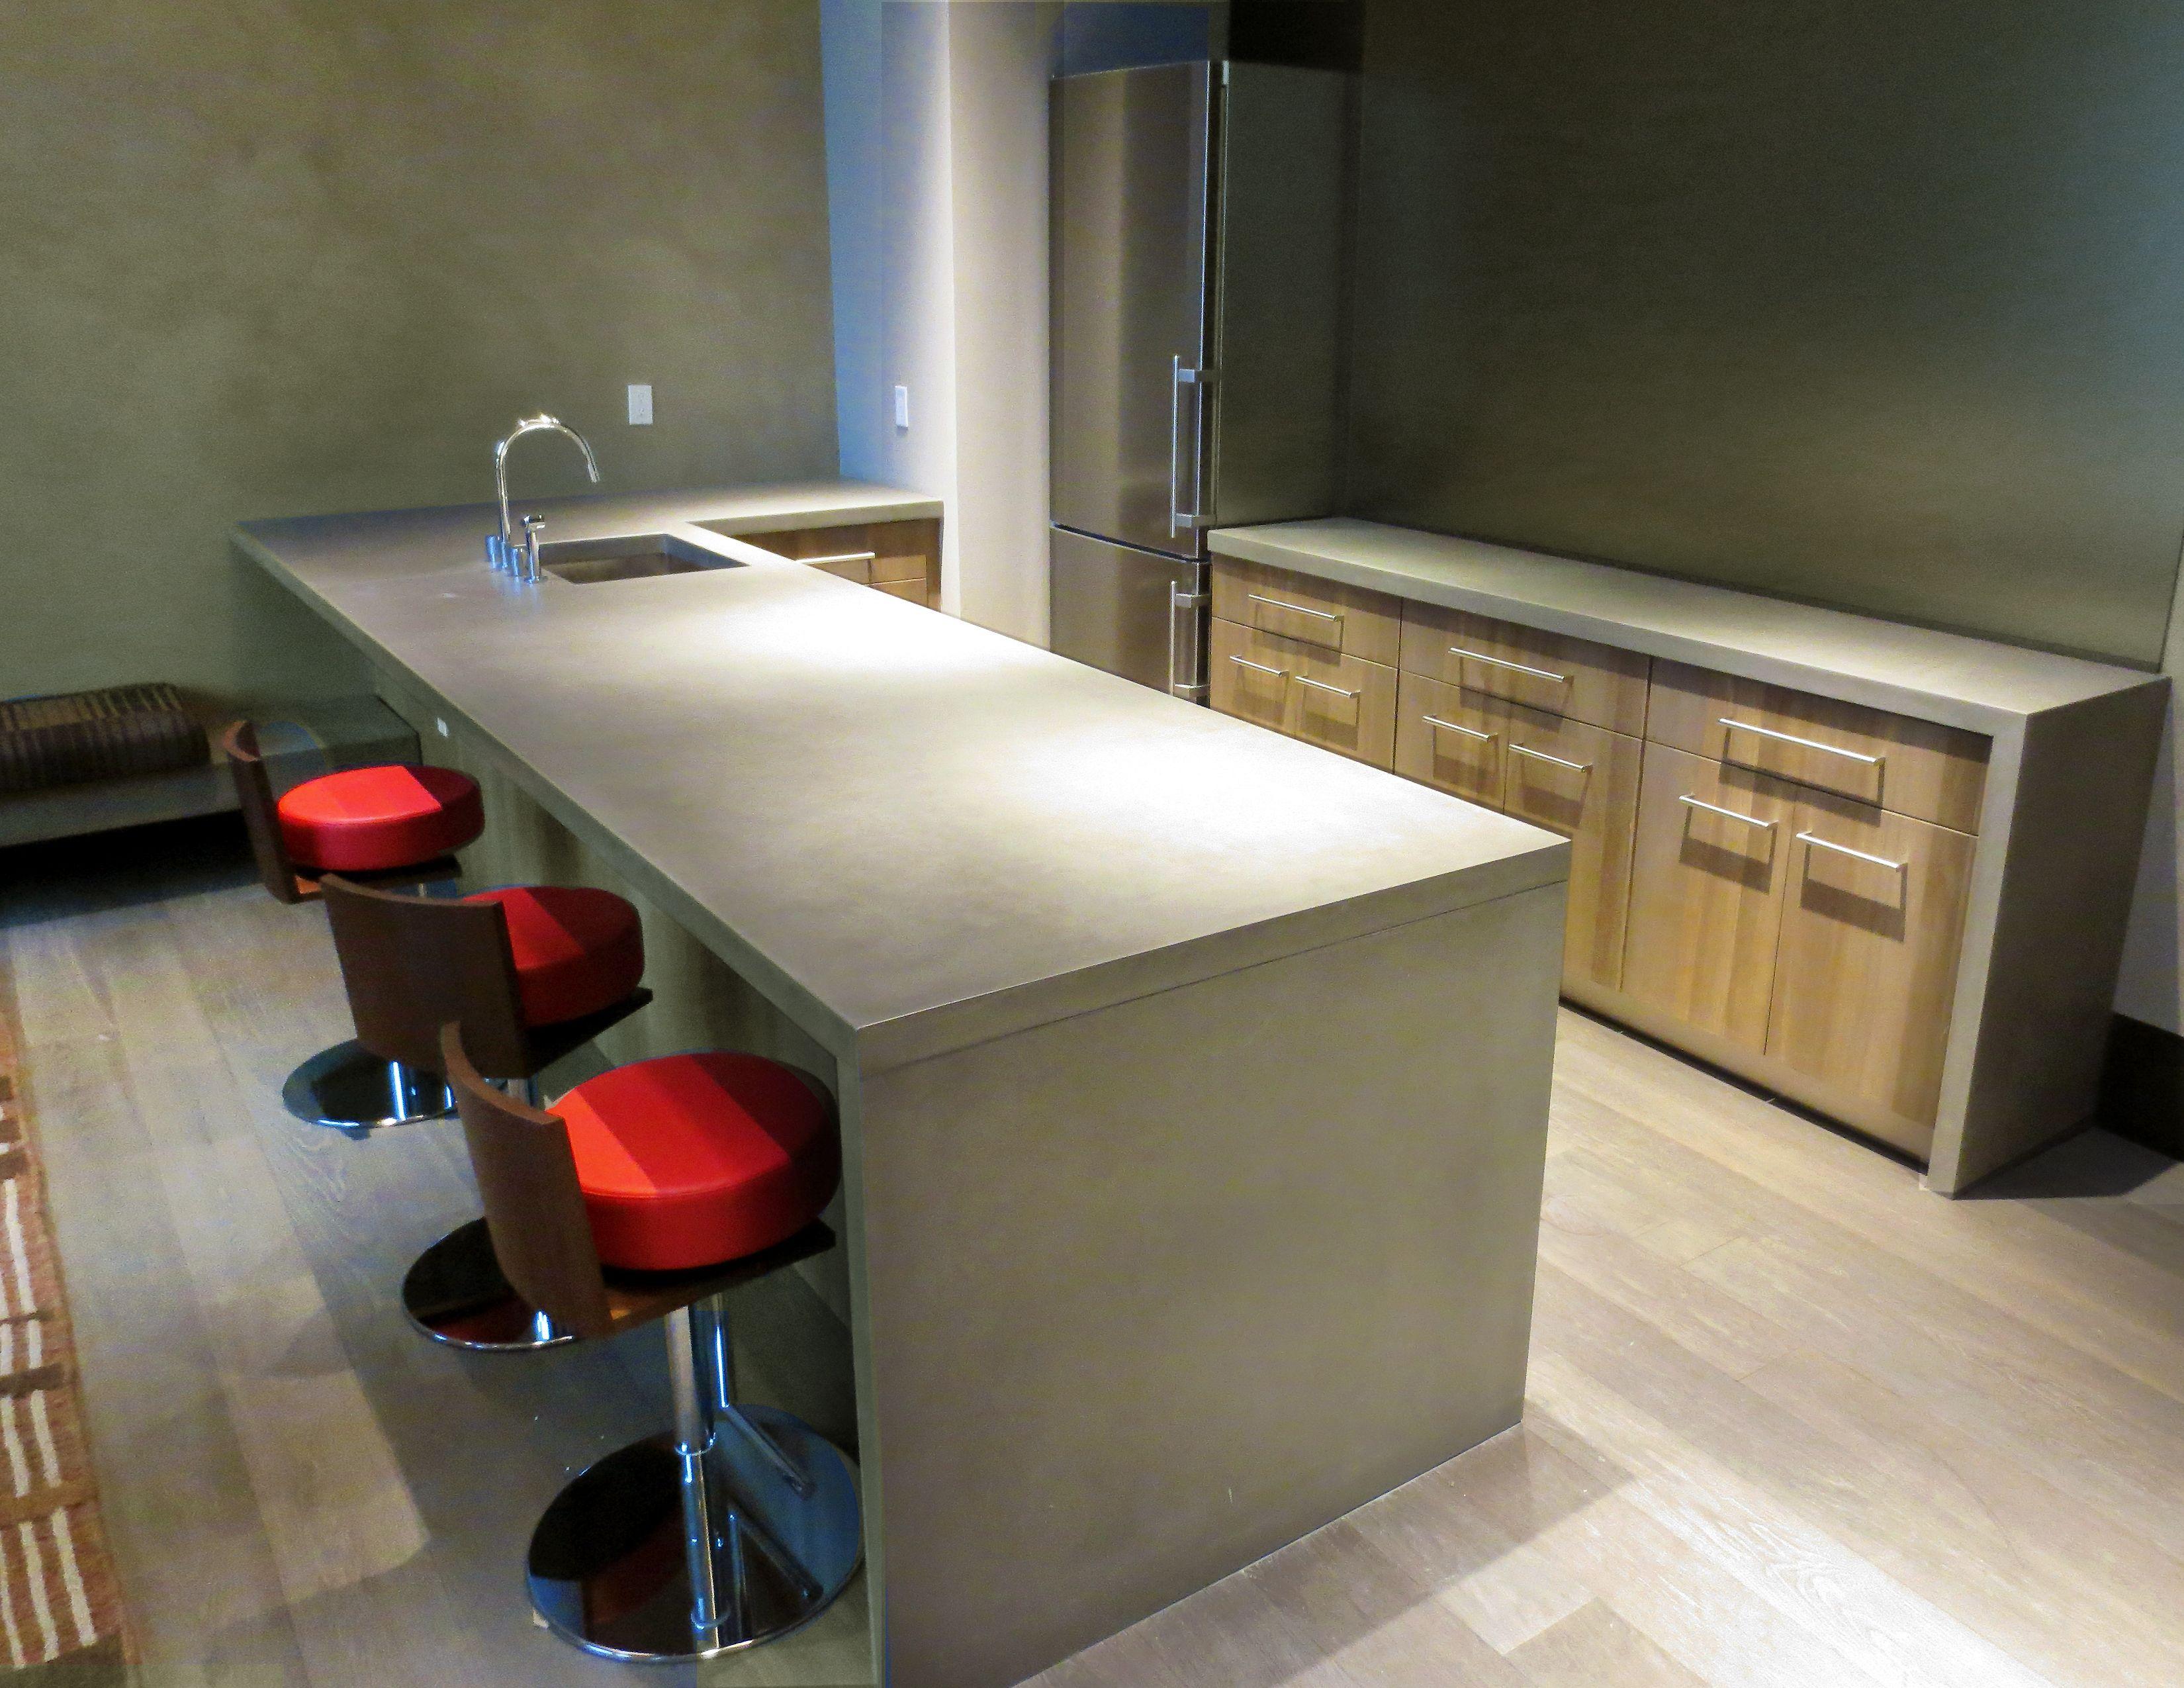 custom concrete kitchen countertops trueform concr concrete kitchen countertops Contemporary Concrete kitchen countertop with a waterfall leg by Trueform Concrete